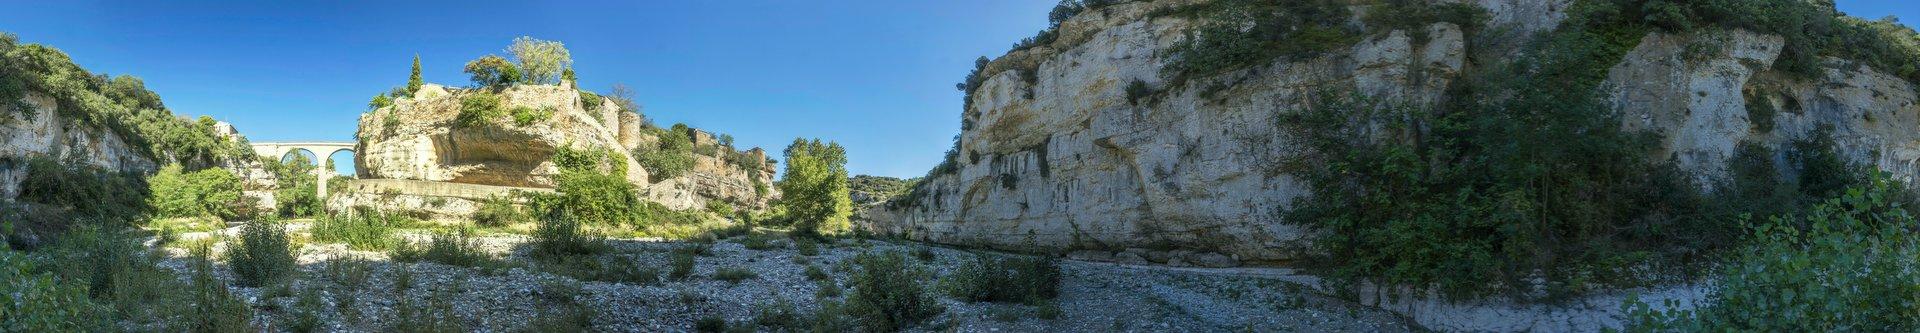 360° Panorama vom Flusstal des Cesse bei Minerve